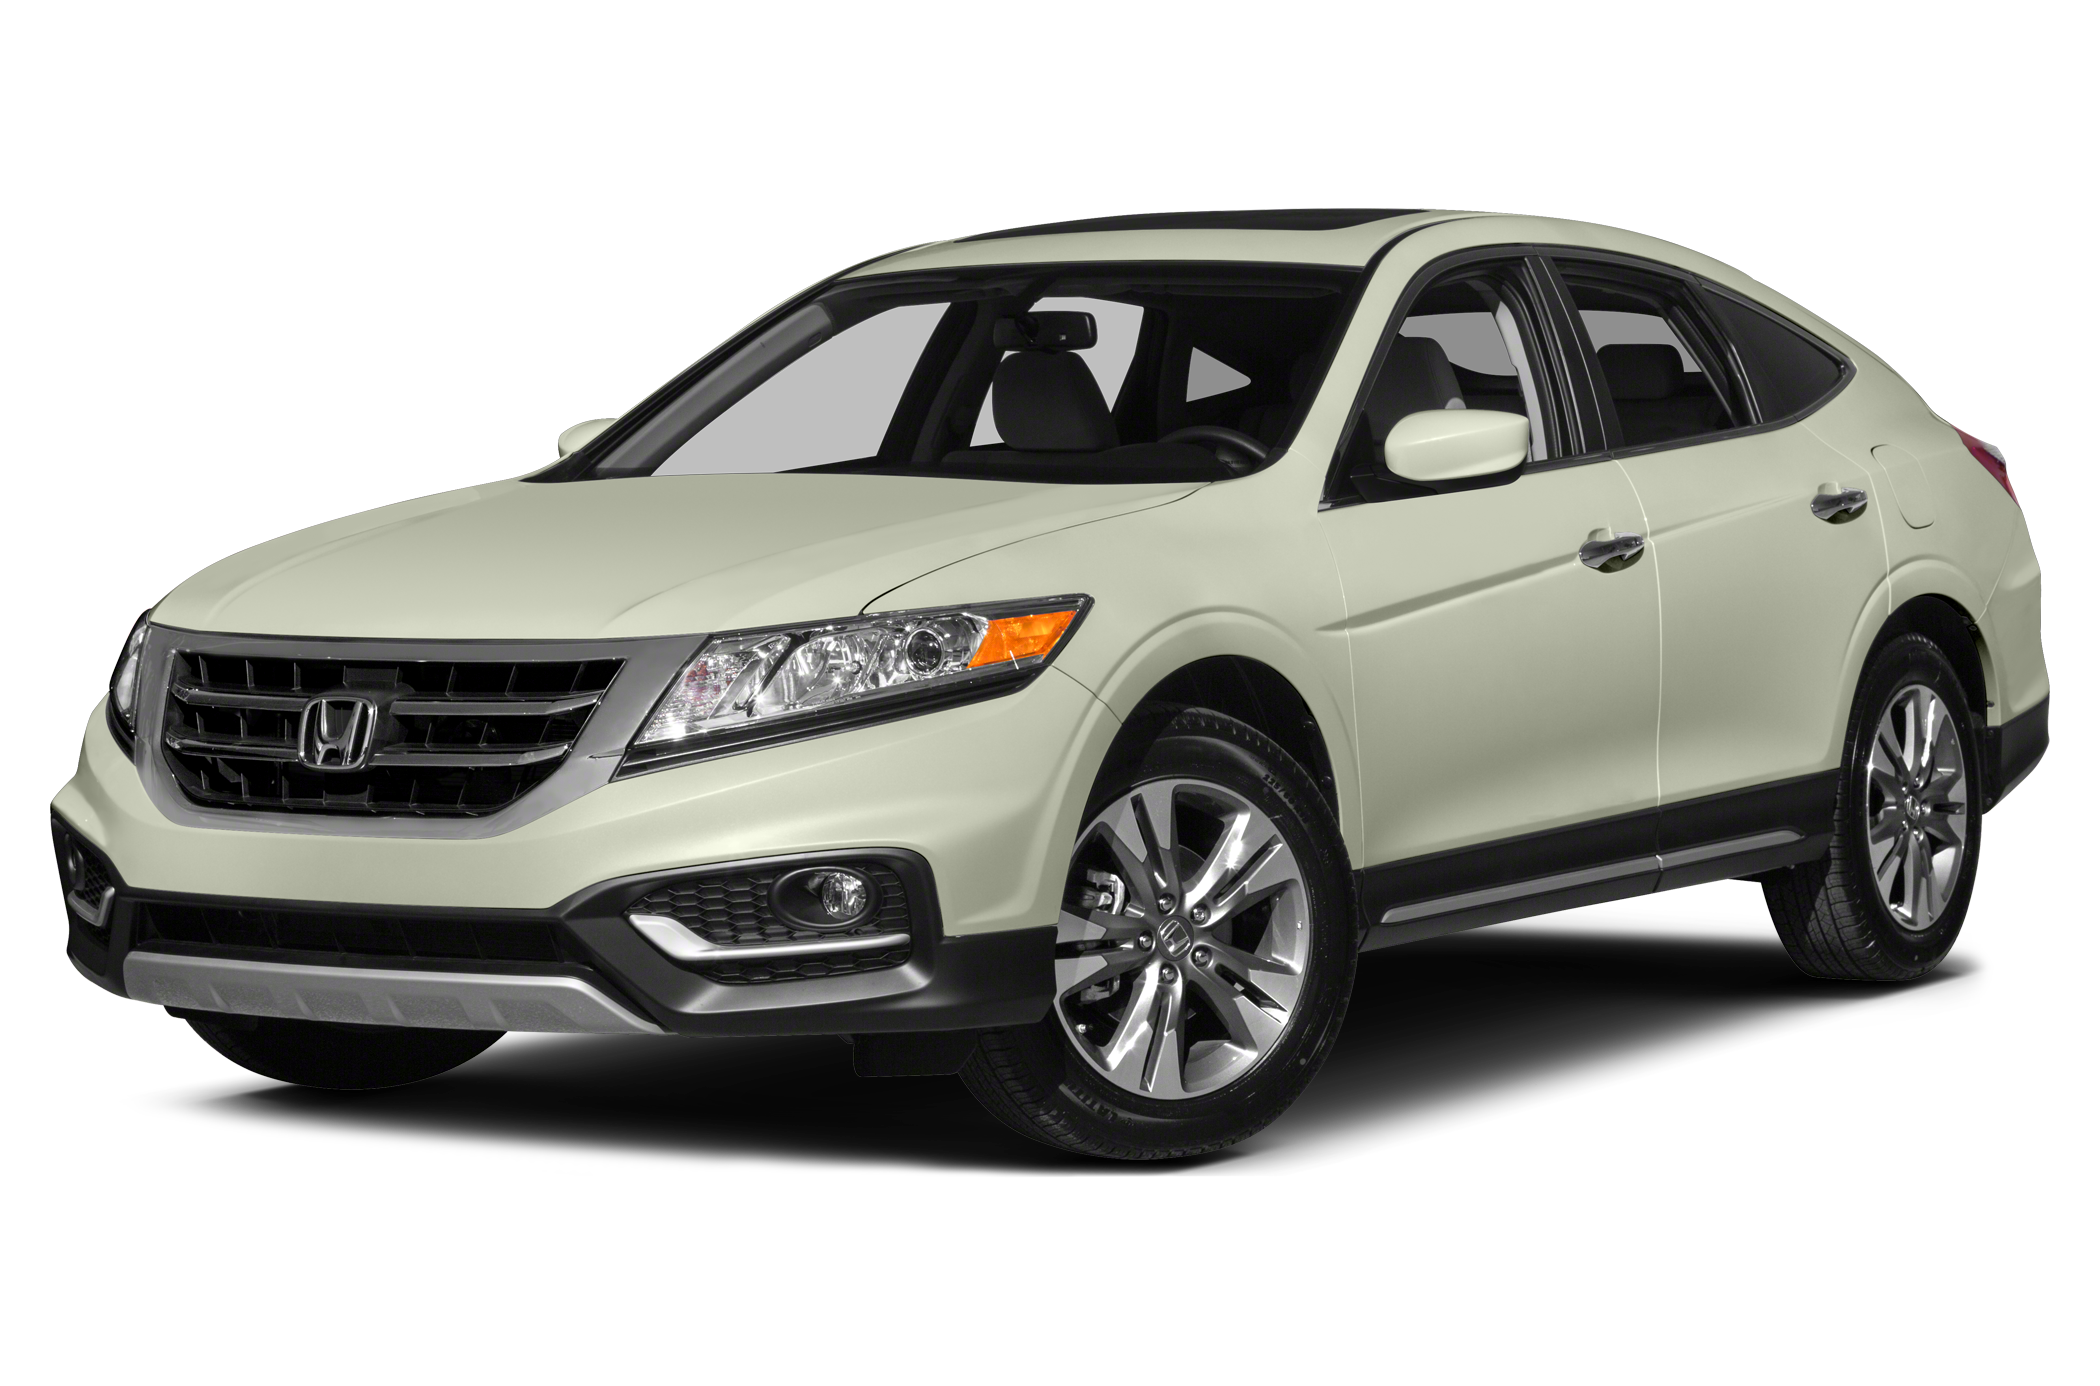 Honda Accord 2018 Maroc >> 2014 Honda Jazz Features.html | Autos Post